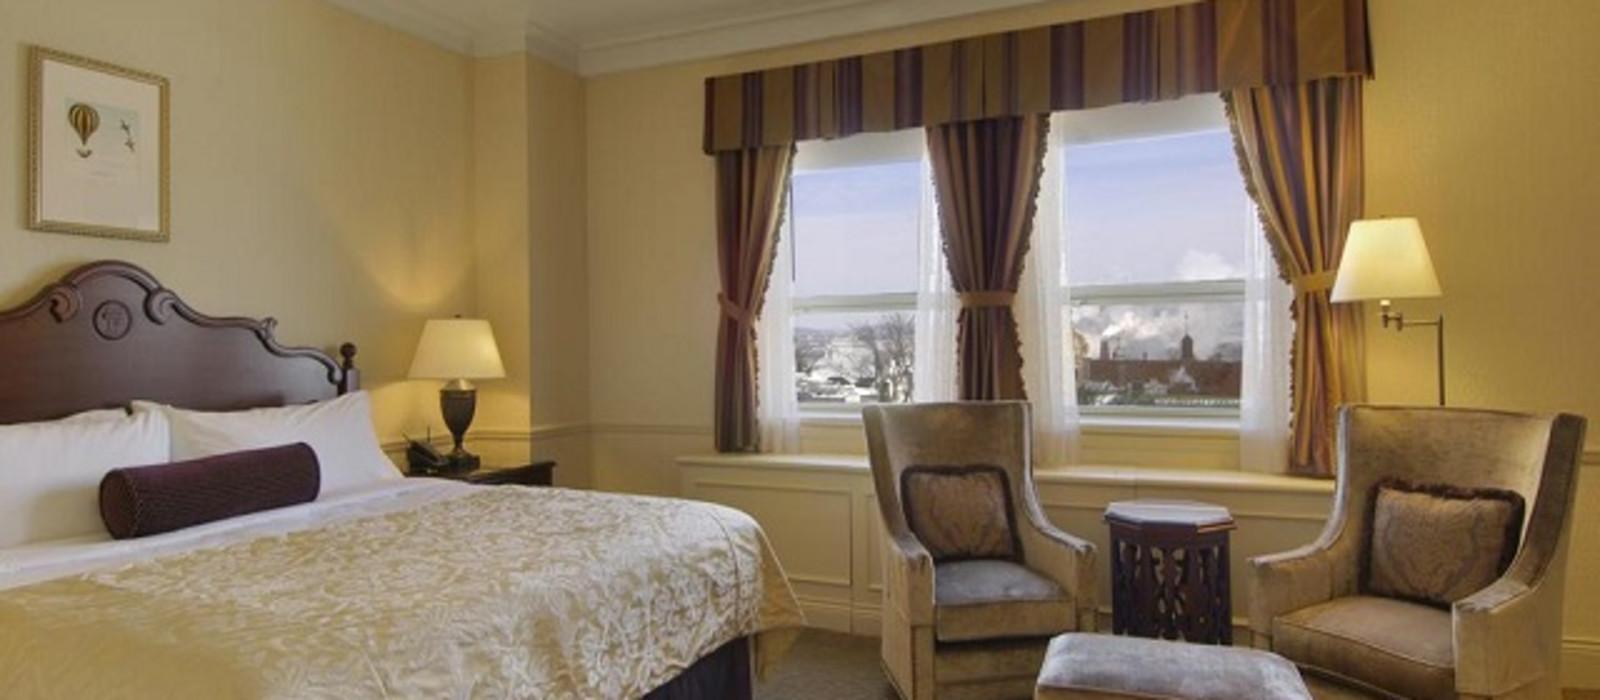 Hotel Fairmont Chateau Frontenac Kanada